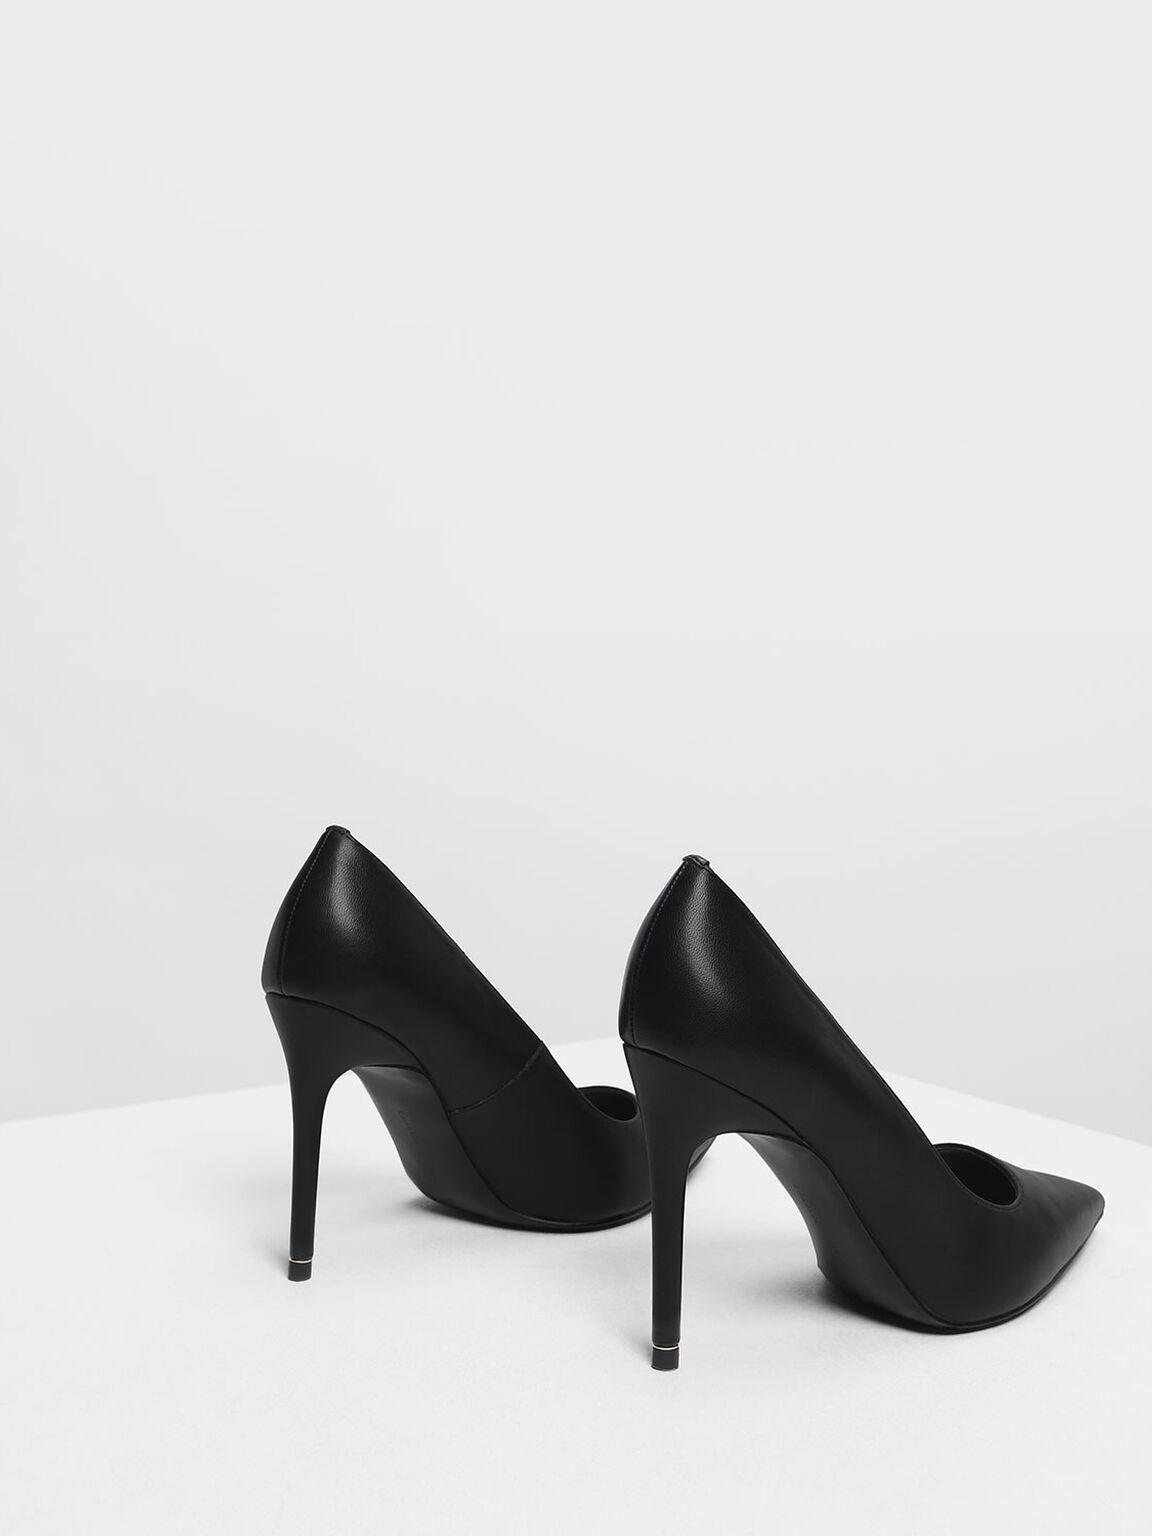 Pointed Toe Pumps, Black, hi-res